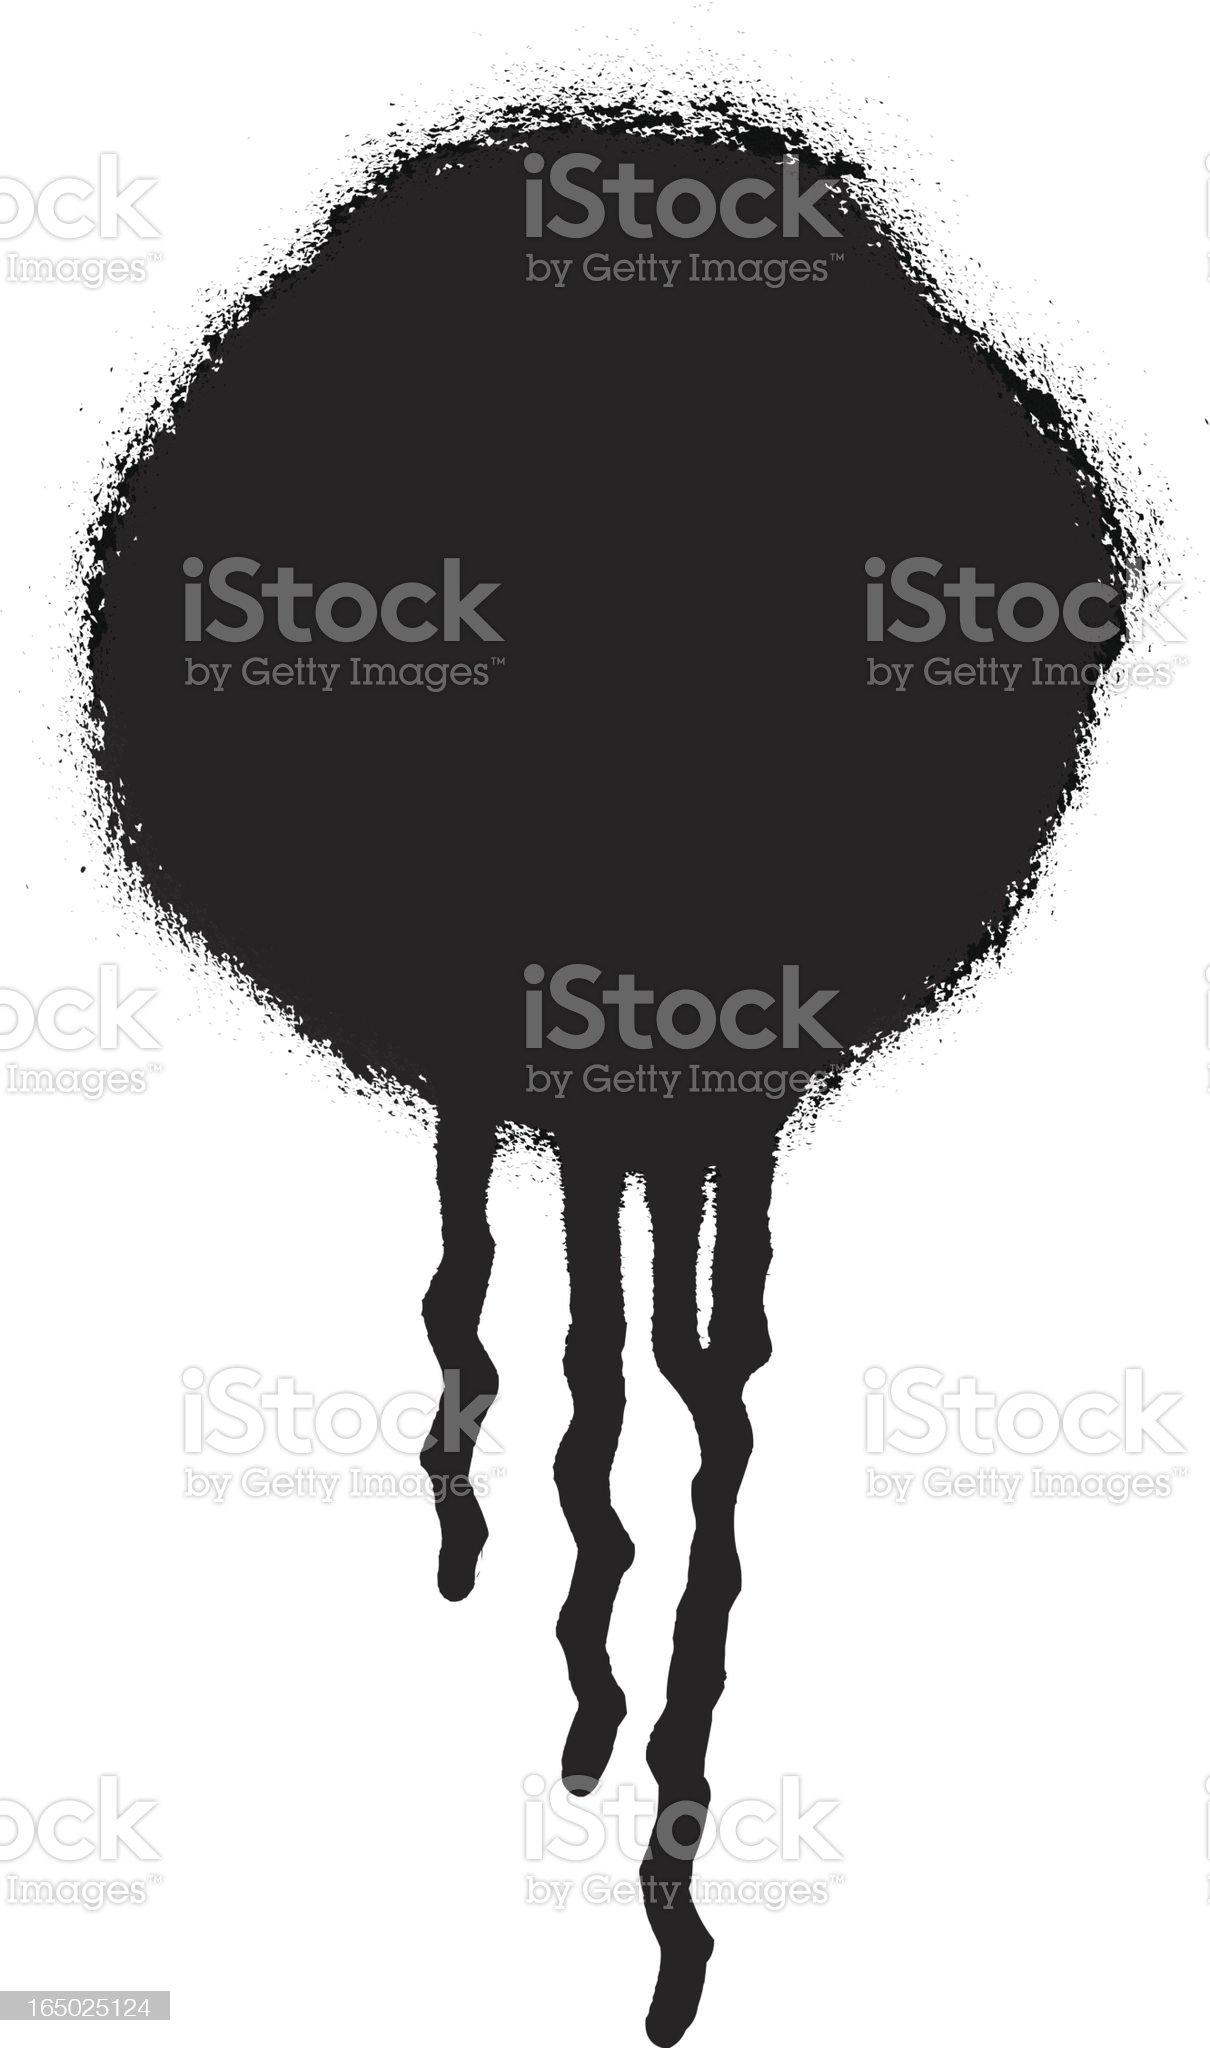 Spray Paint Drip_2 royalty-free stock vector art